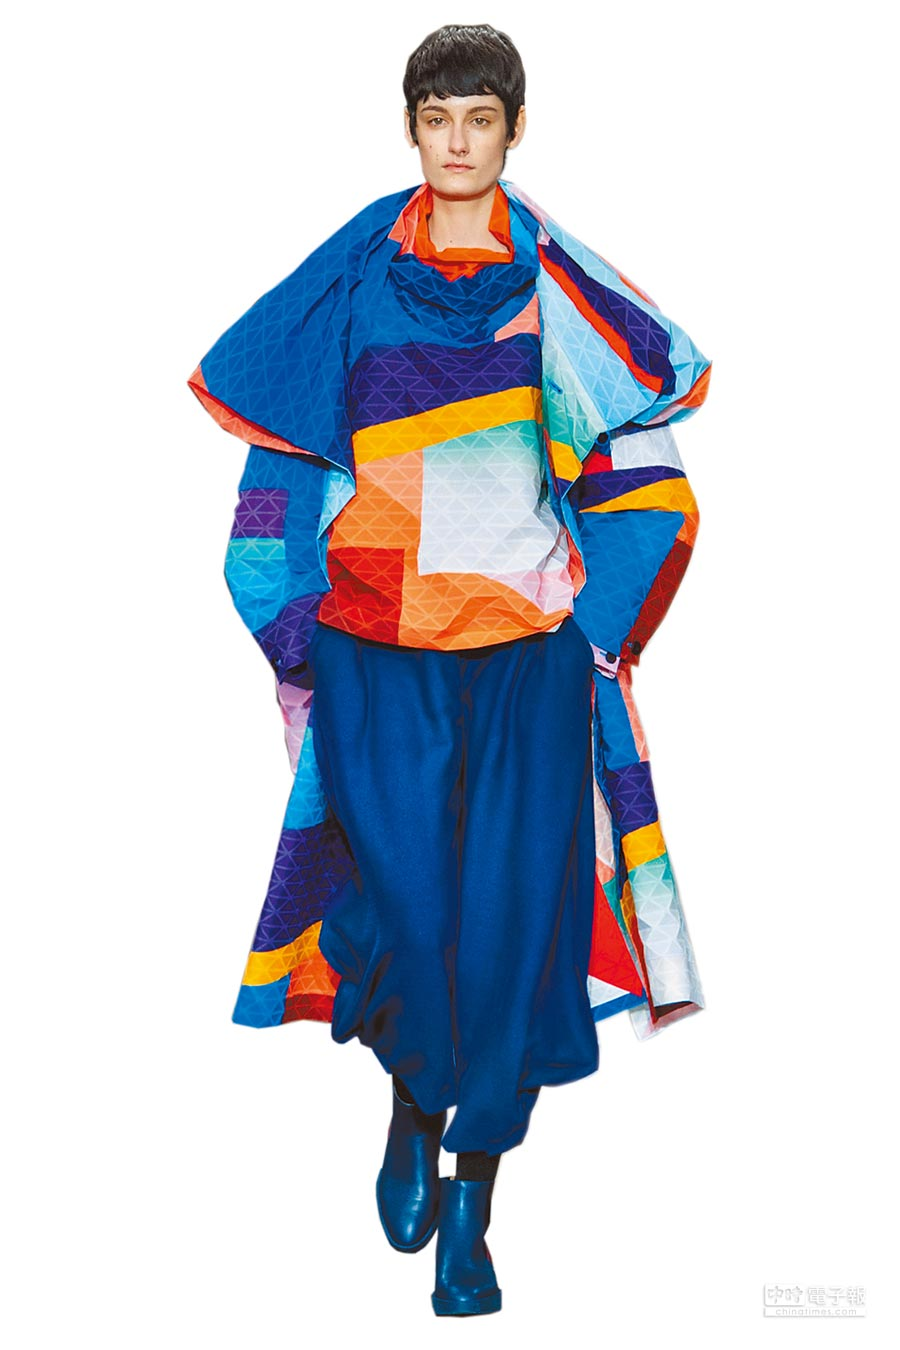 ISSEY MIYAKE的全新布料「BLINK」,菱形格紋讓人聯想到熱賣包款BAOBAO。(ISSEY MIYAKE提供)